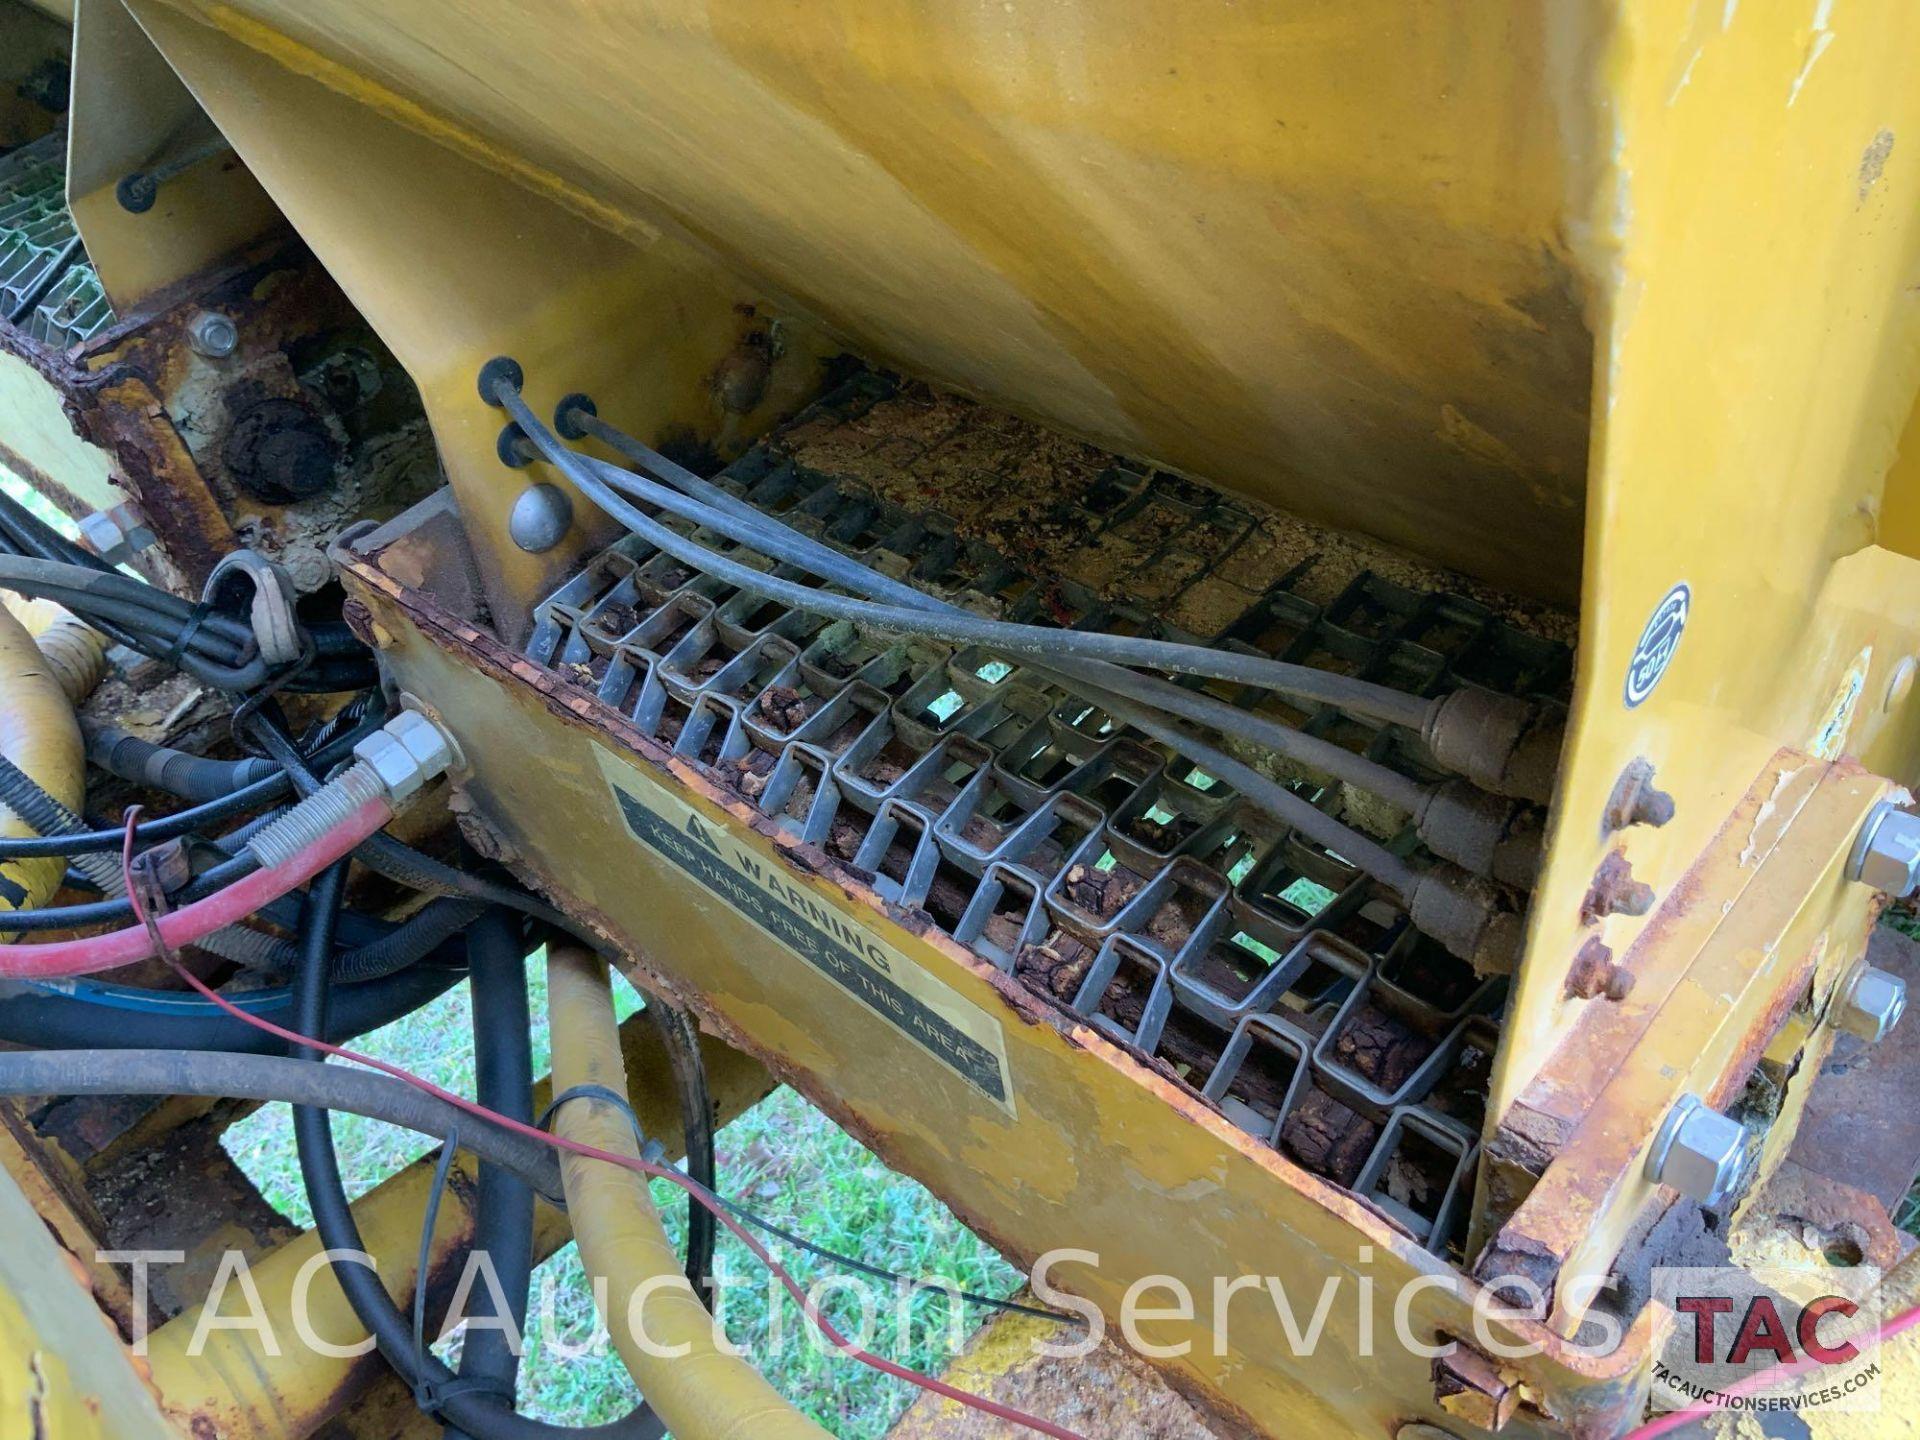 AirMax 1000 Dry Fertilizer Spreader - Image 24 of 30